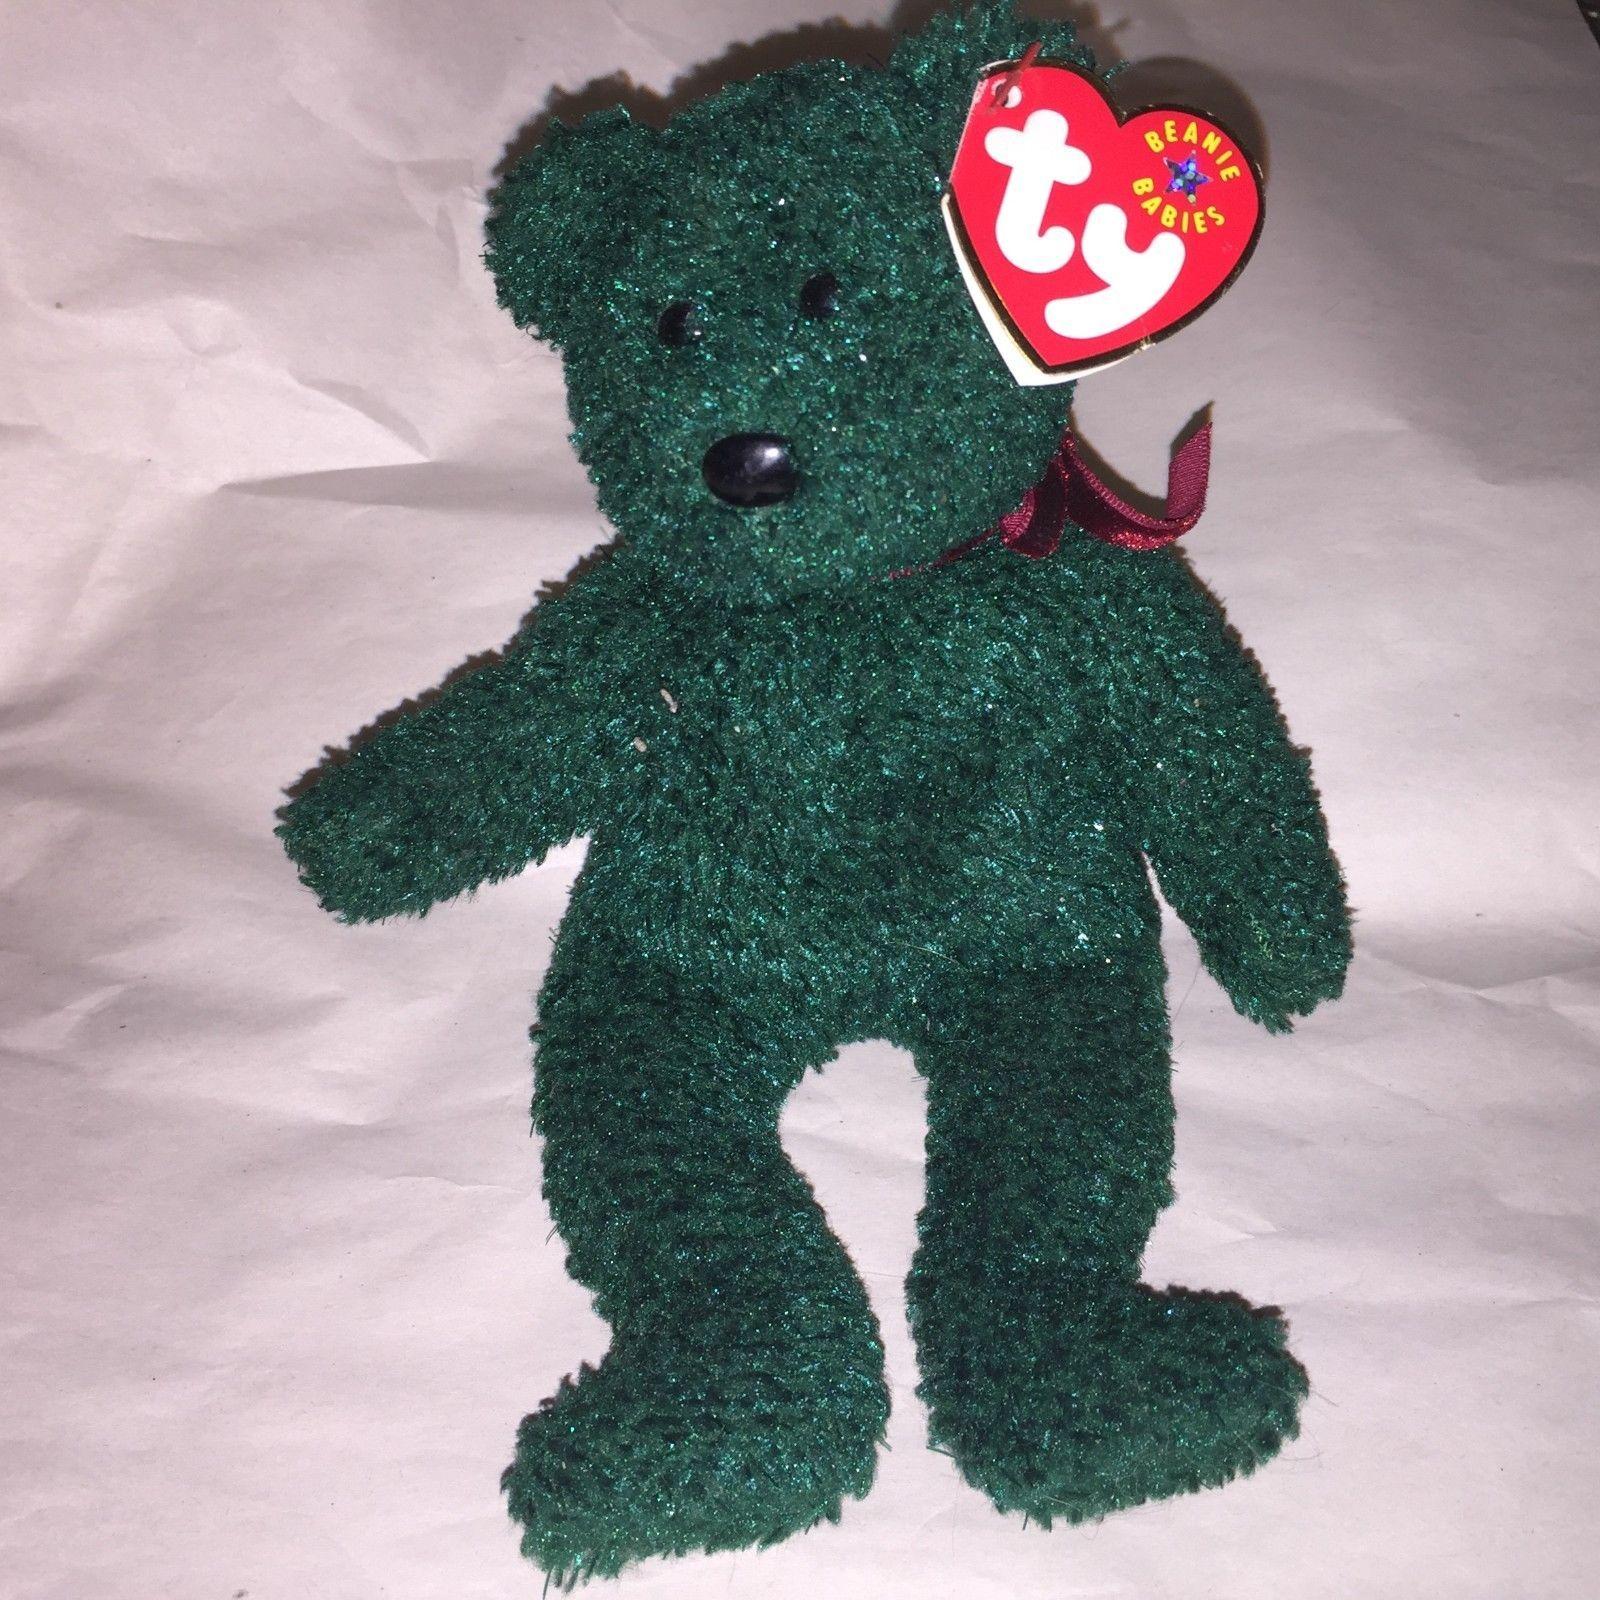 Beautiful Ty Beanie Baby 2001 Holiday Teddy and 27 similar items. S l1600 26e9ecb86ed6